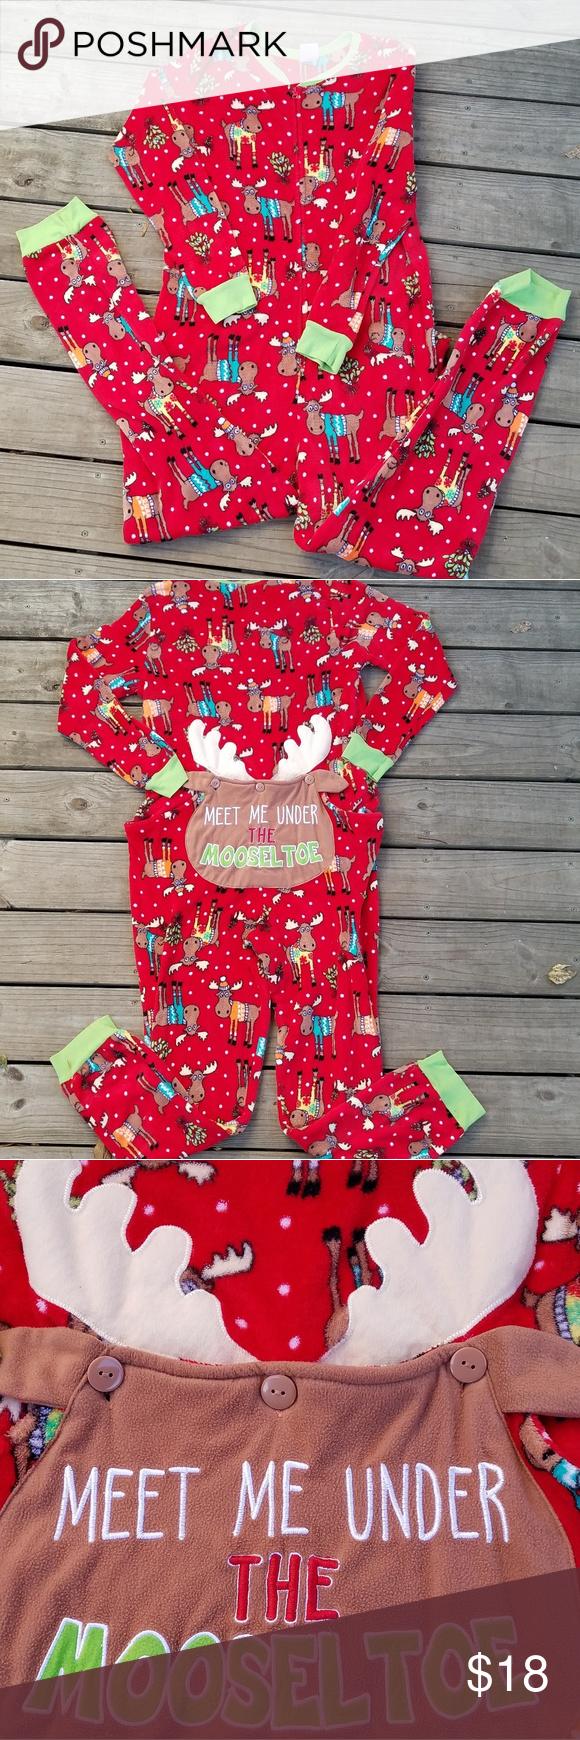 Fleece moose Christmas fleece onesie | Onesies, Fleece